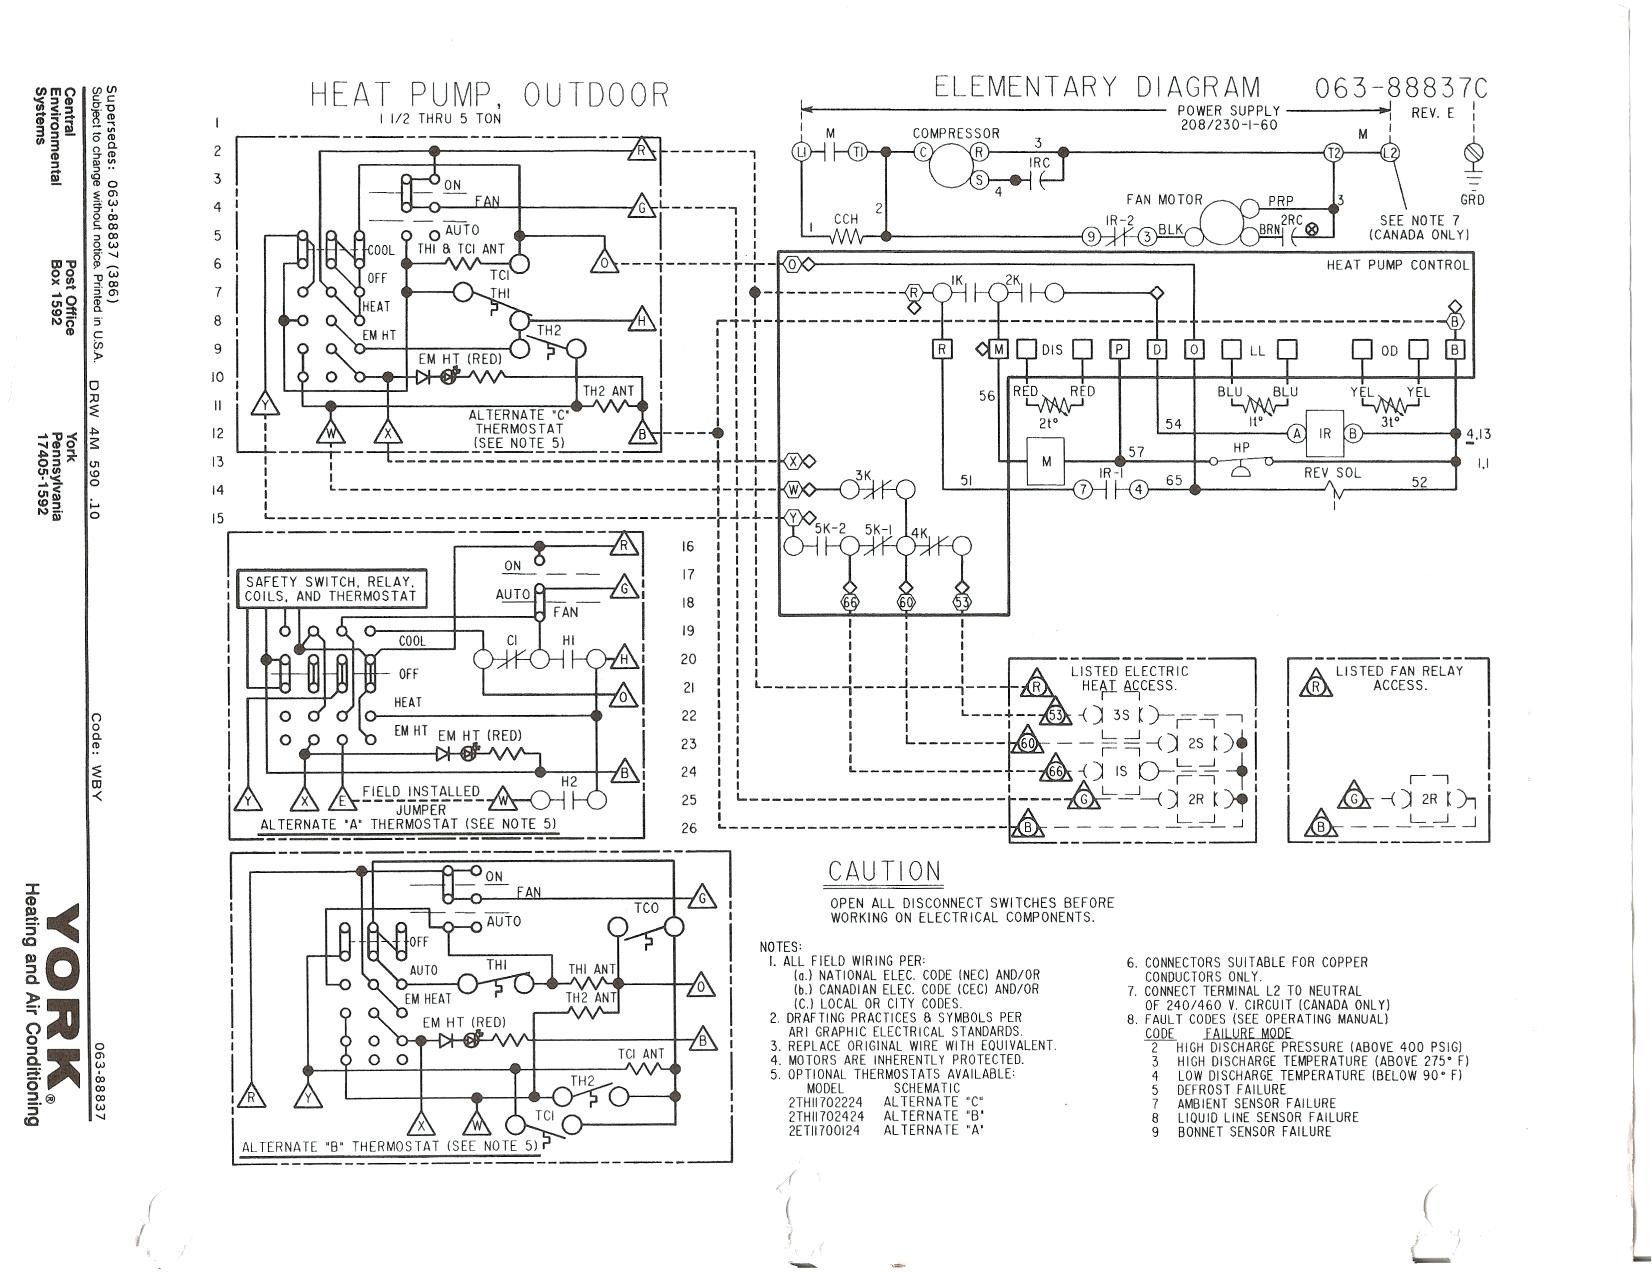 Carrier Heat Pump thermostat Wiring Diagram Goodman Heat Pump Wiring Diagram Best thermostat for Of Carrier Heat Pump thermostat Wiring Diagram